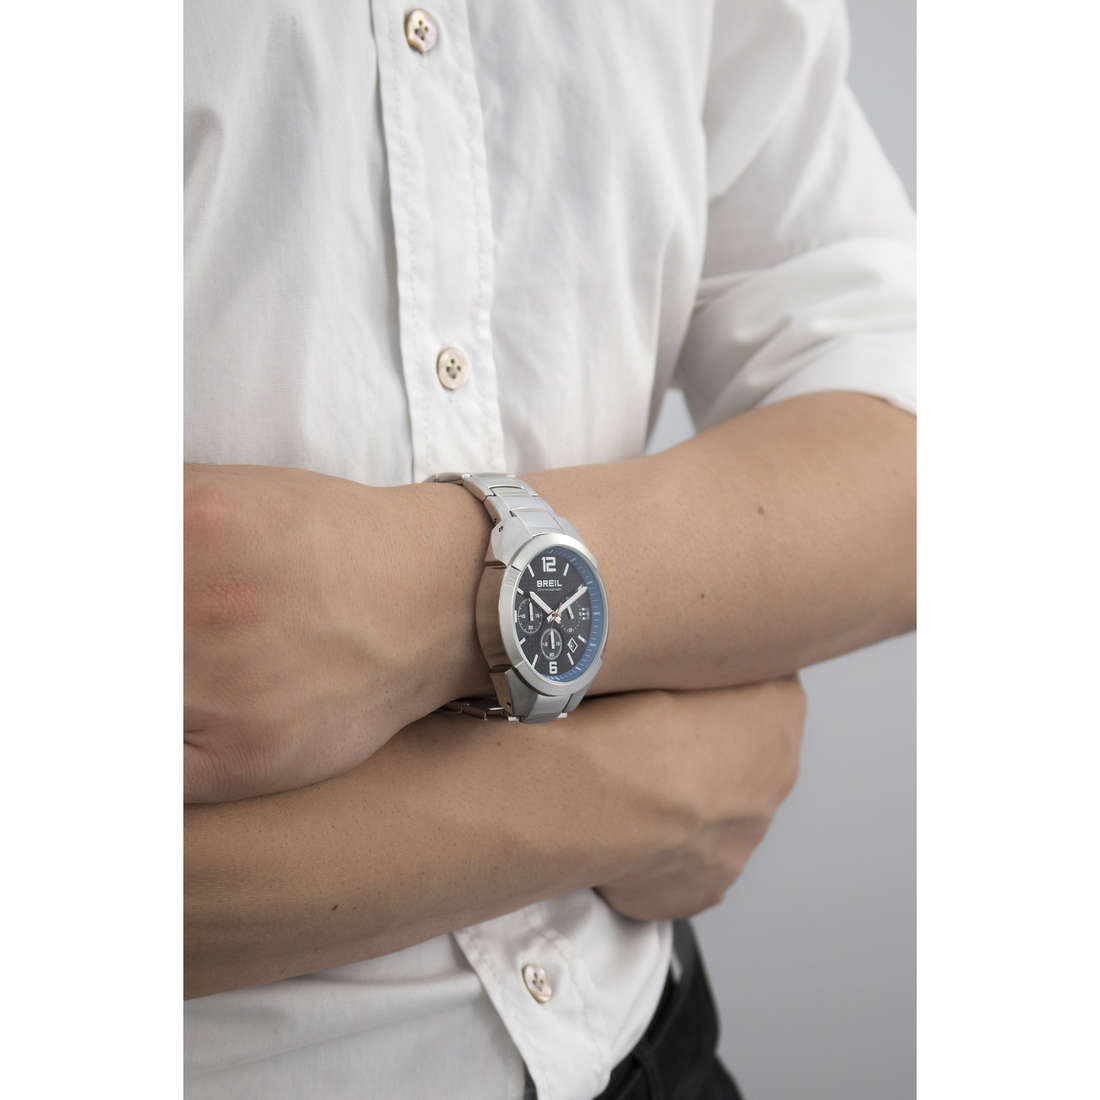 Breil cronografi Gap uomo TW1379 indosso